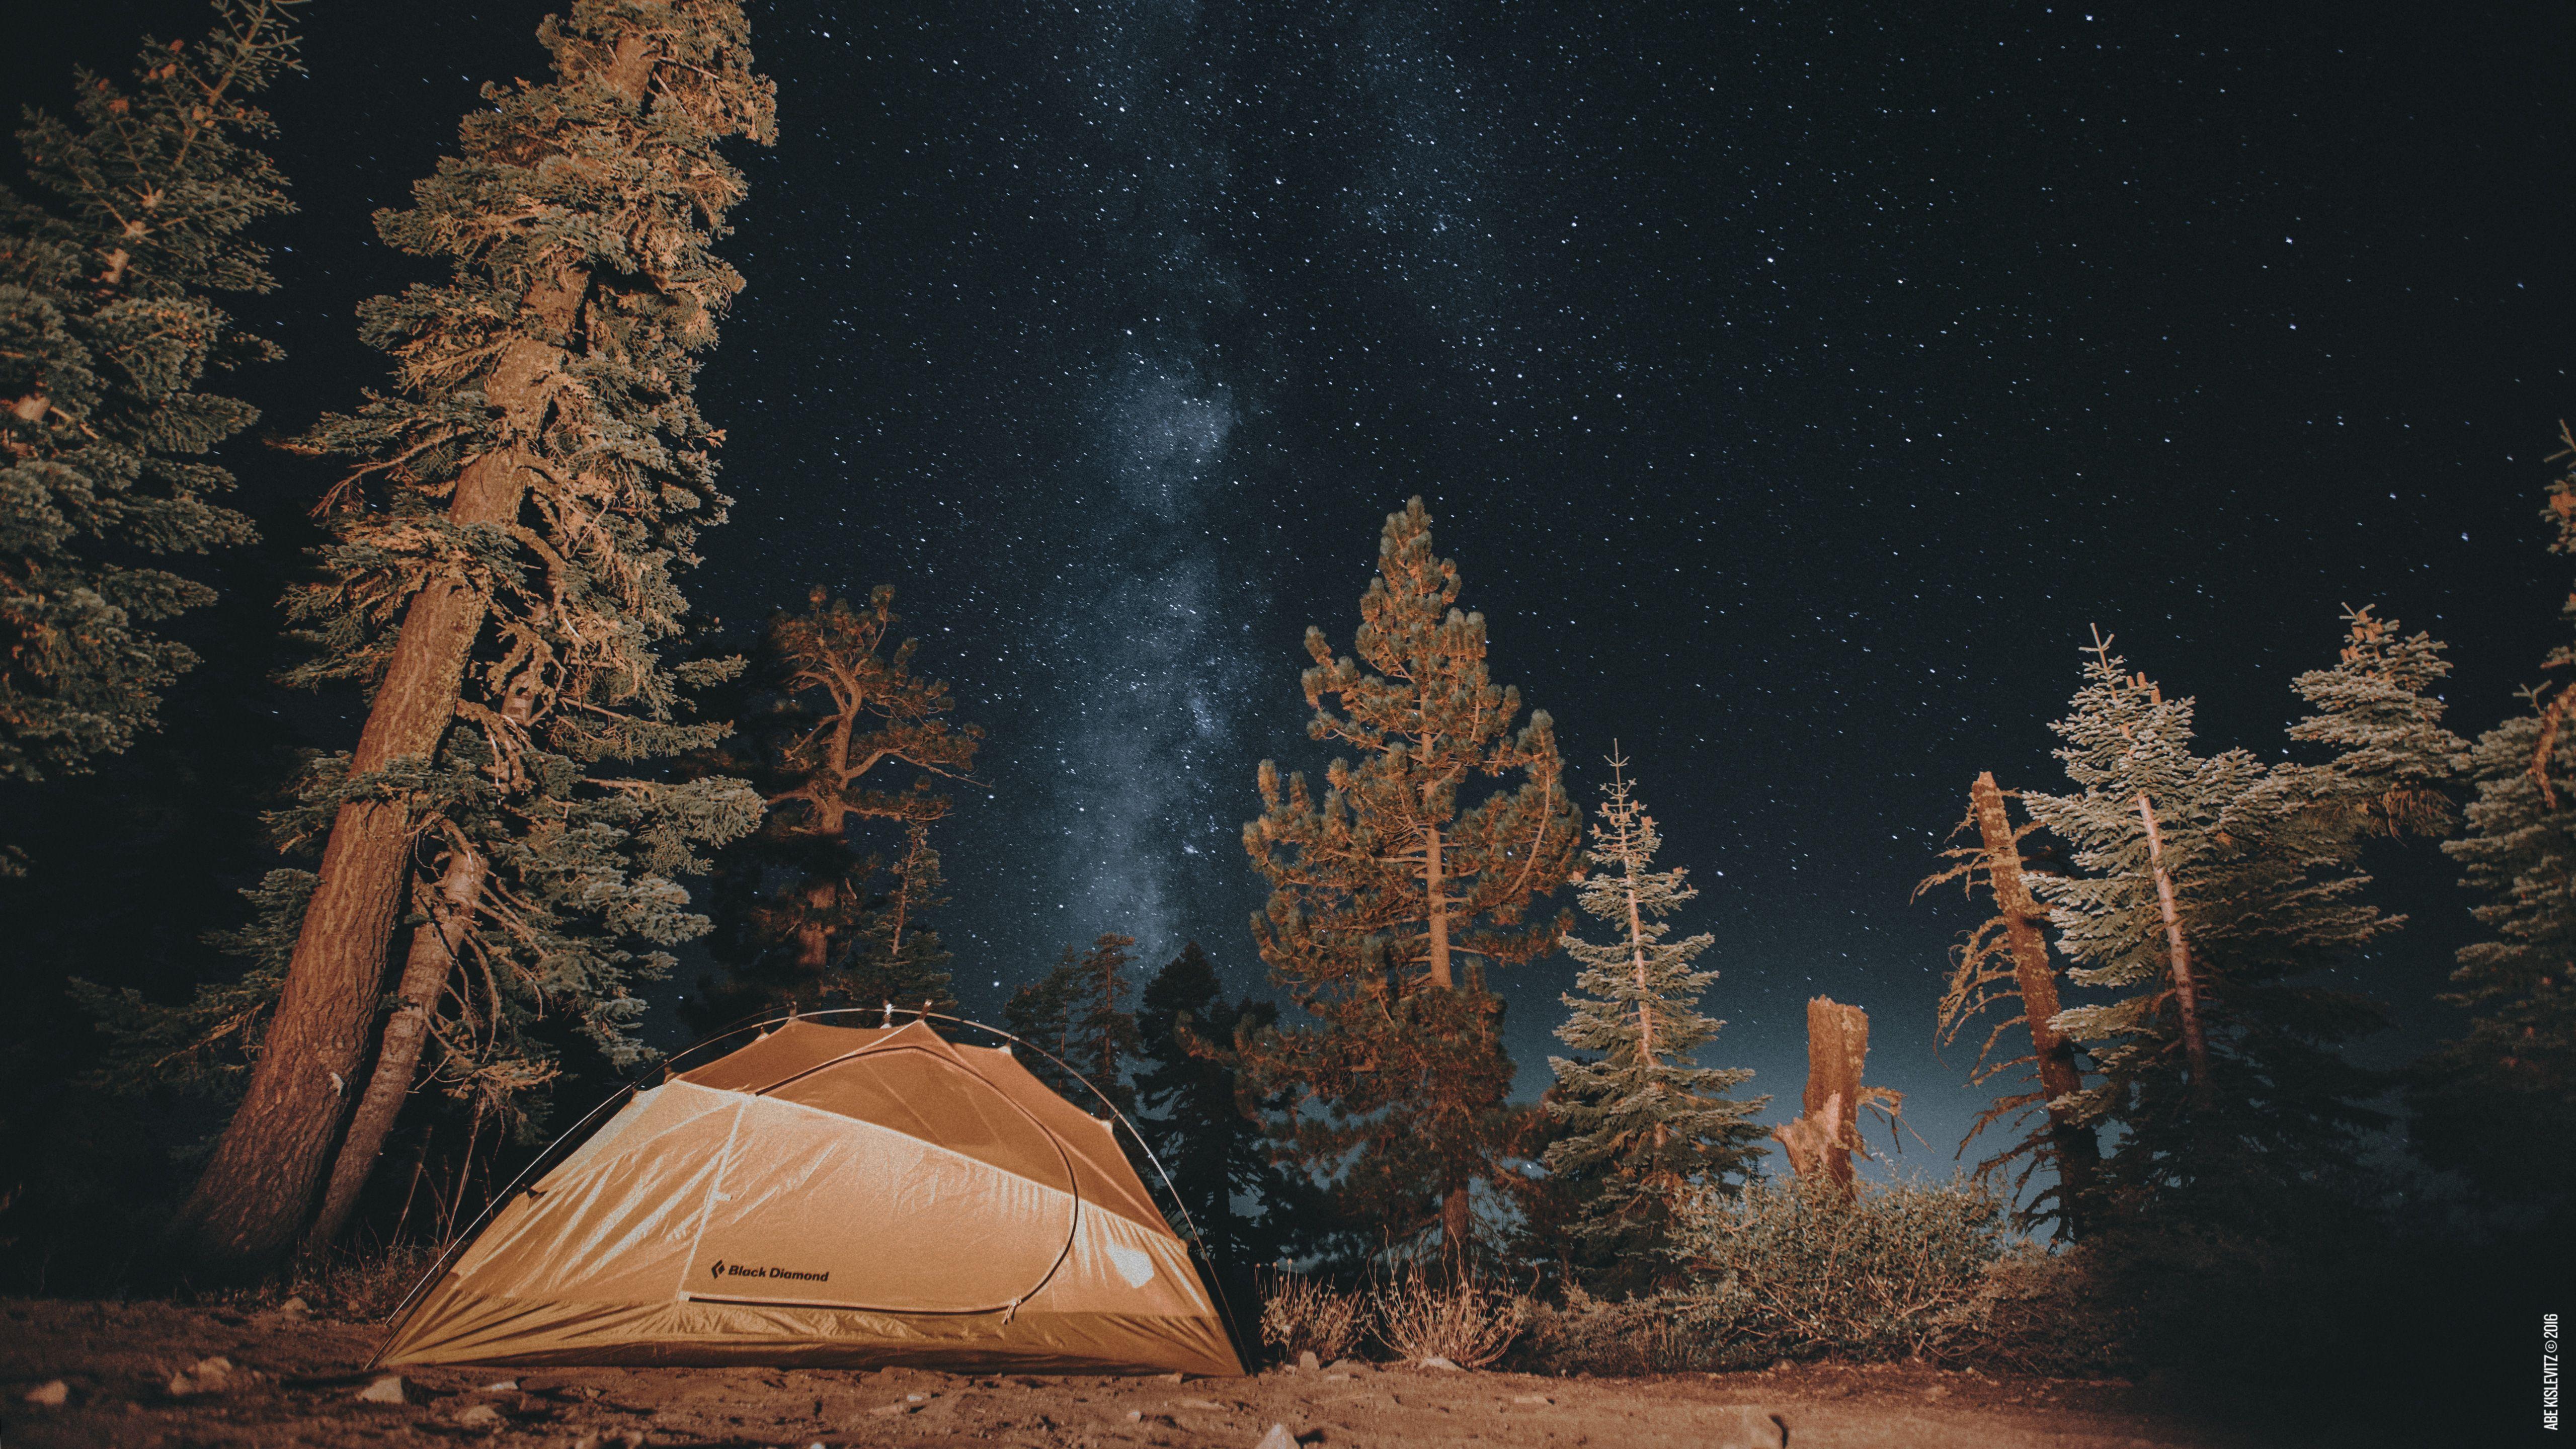 Campsite Wallpapers   Top Campsite Backgrounds   WallpaperAccess 5120x2880